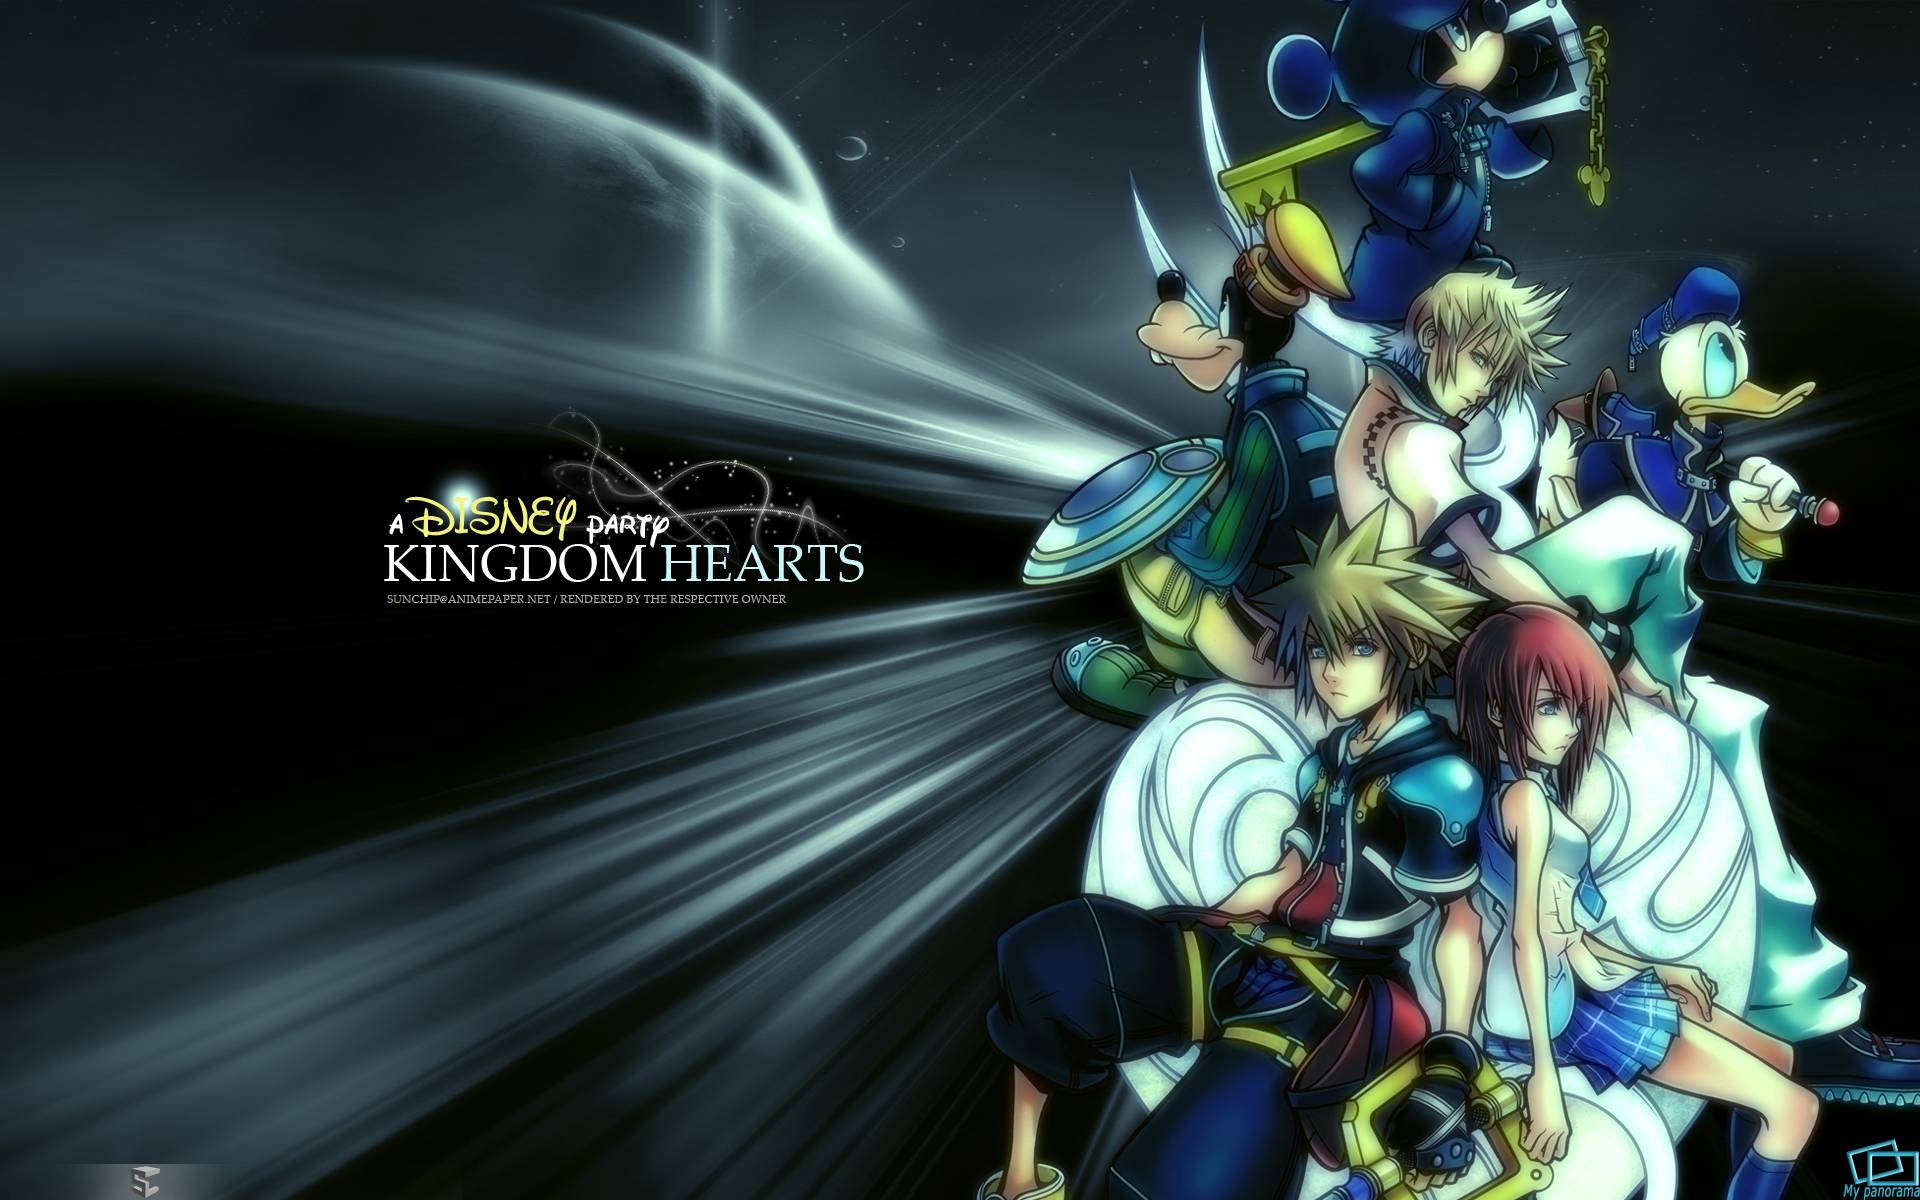 Kingdom Hearts 2 wallpapers Kingdom Hearts 2 background   Page 14 1920x1200